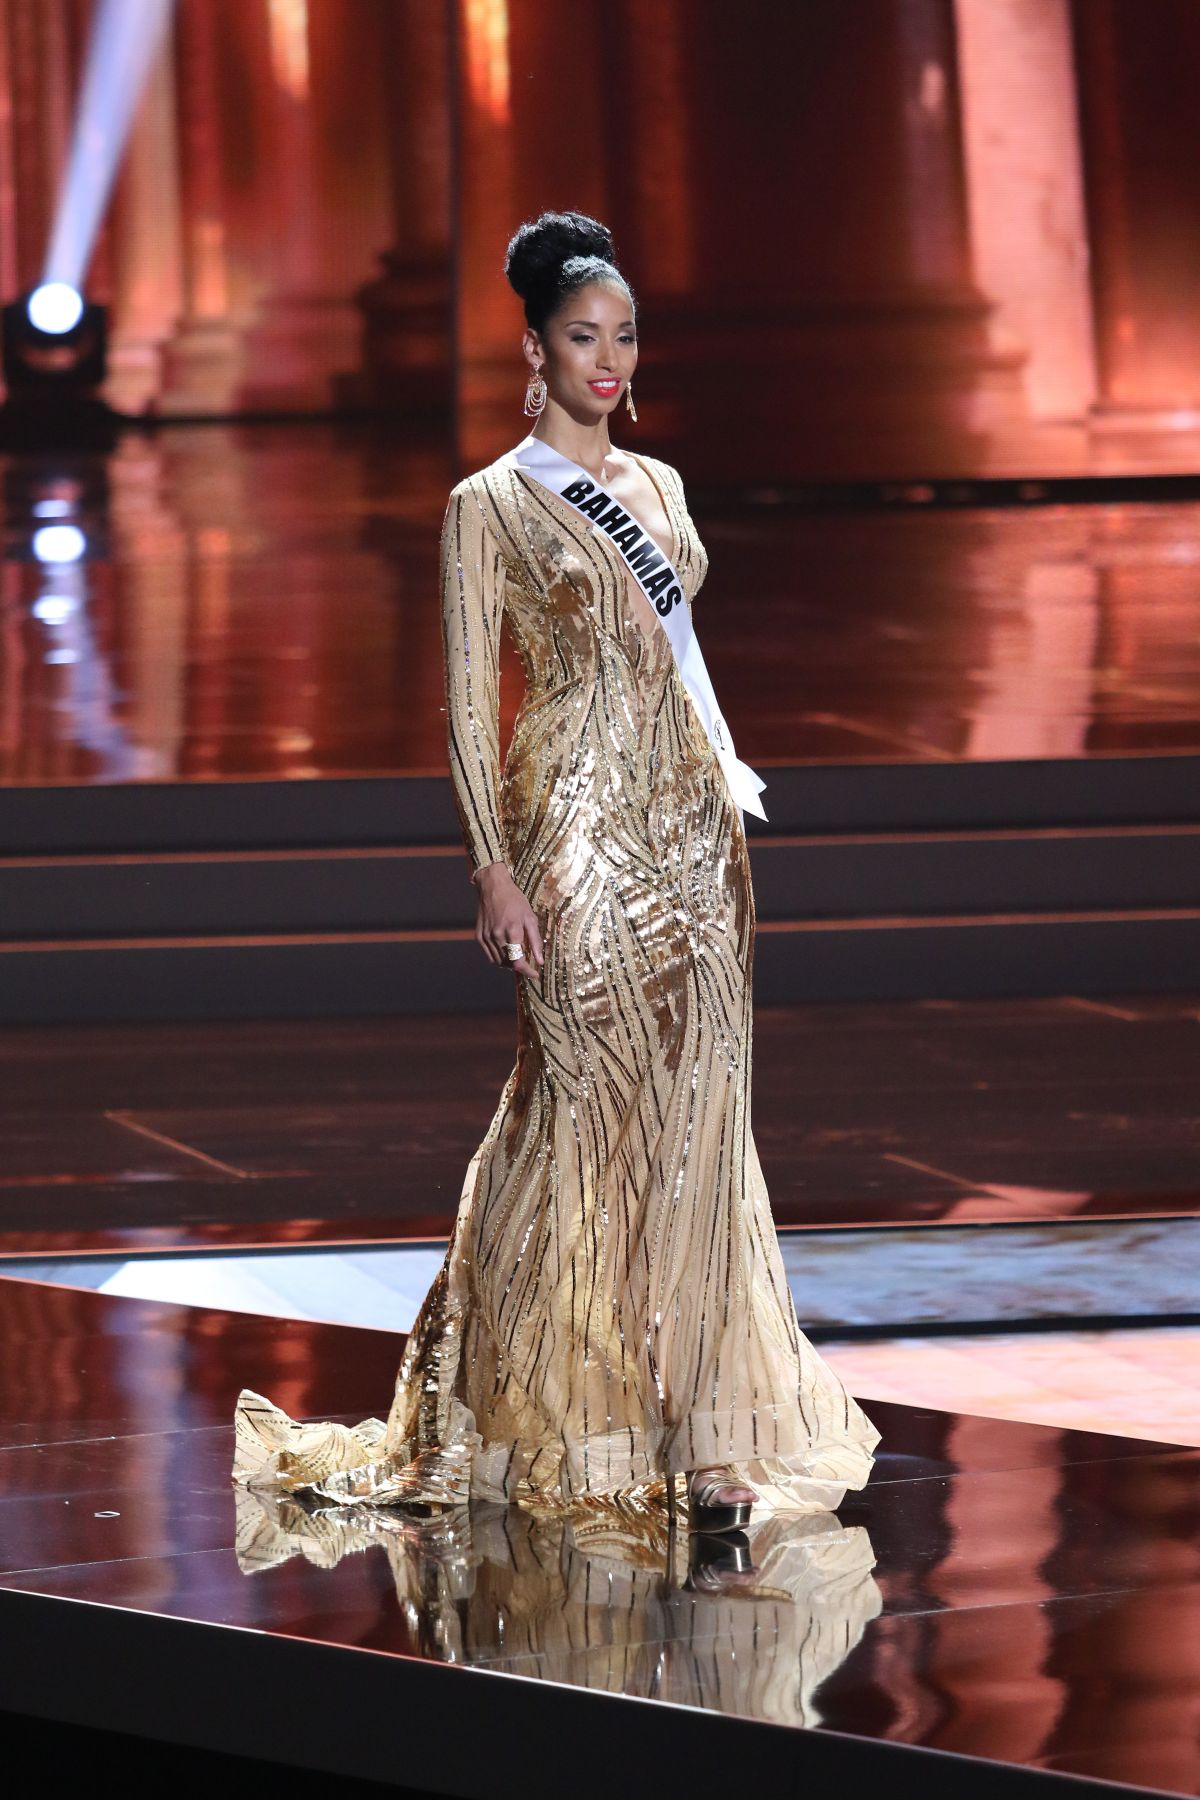 TORIA NICHOLE - Miss Universe 2015 Preliminary Round 12/16/2015